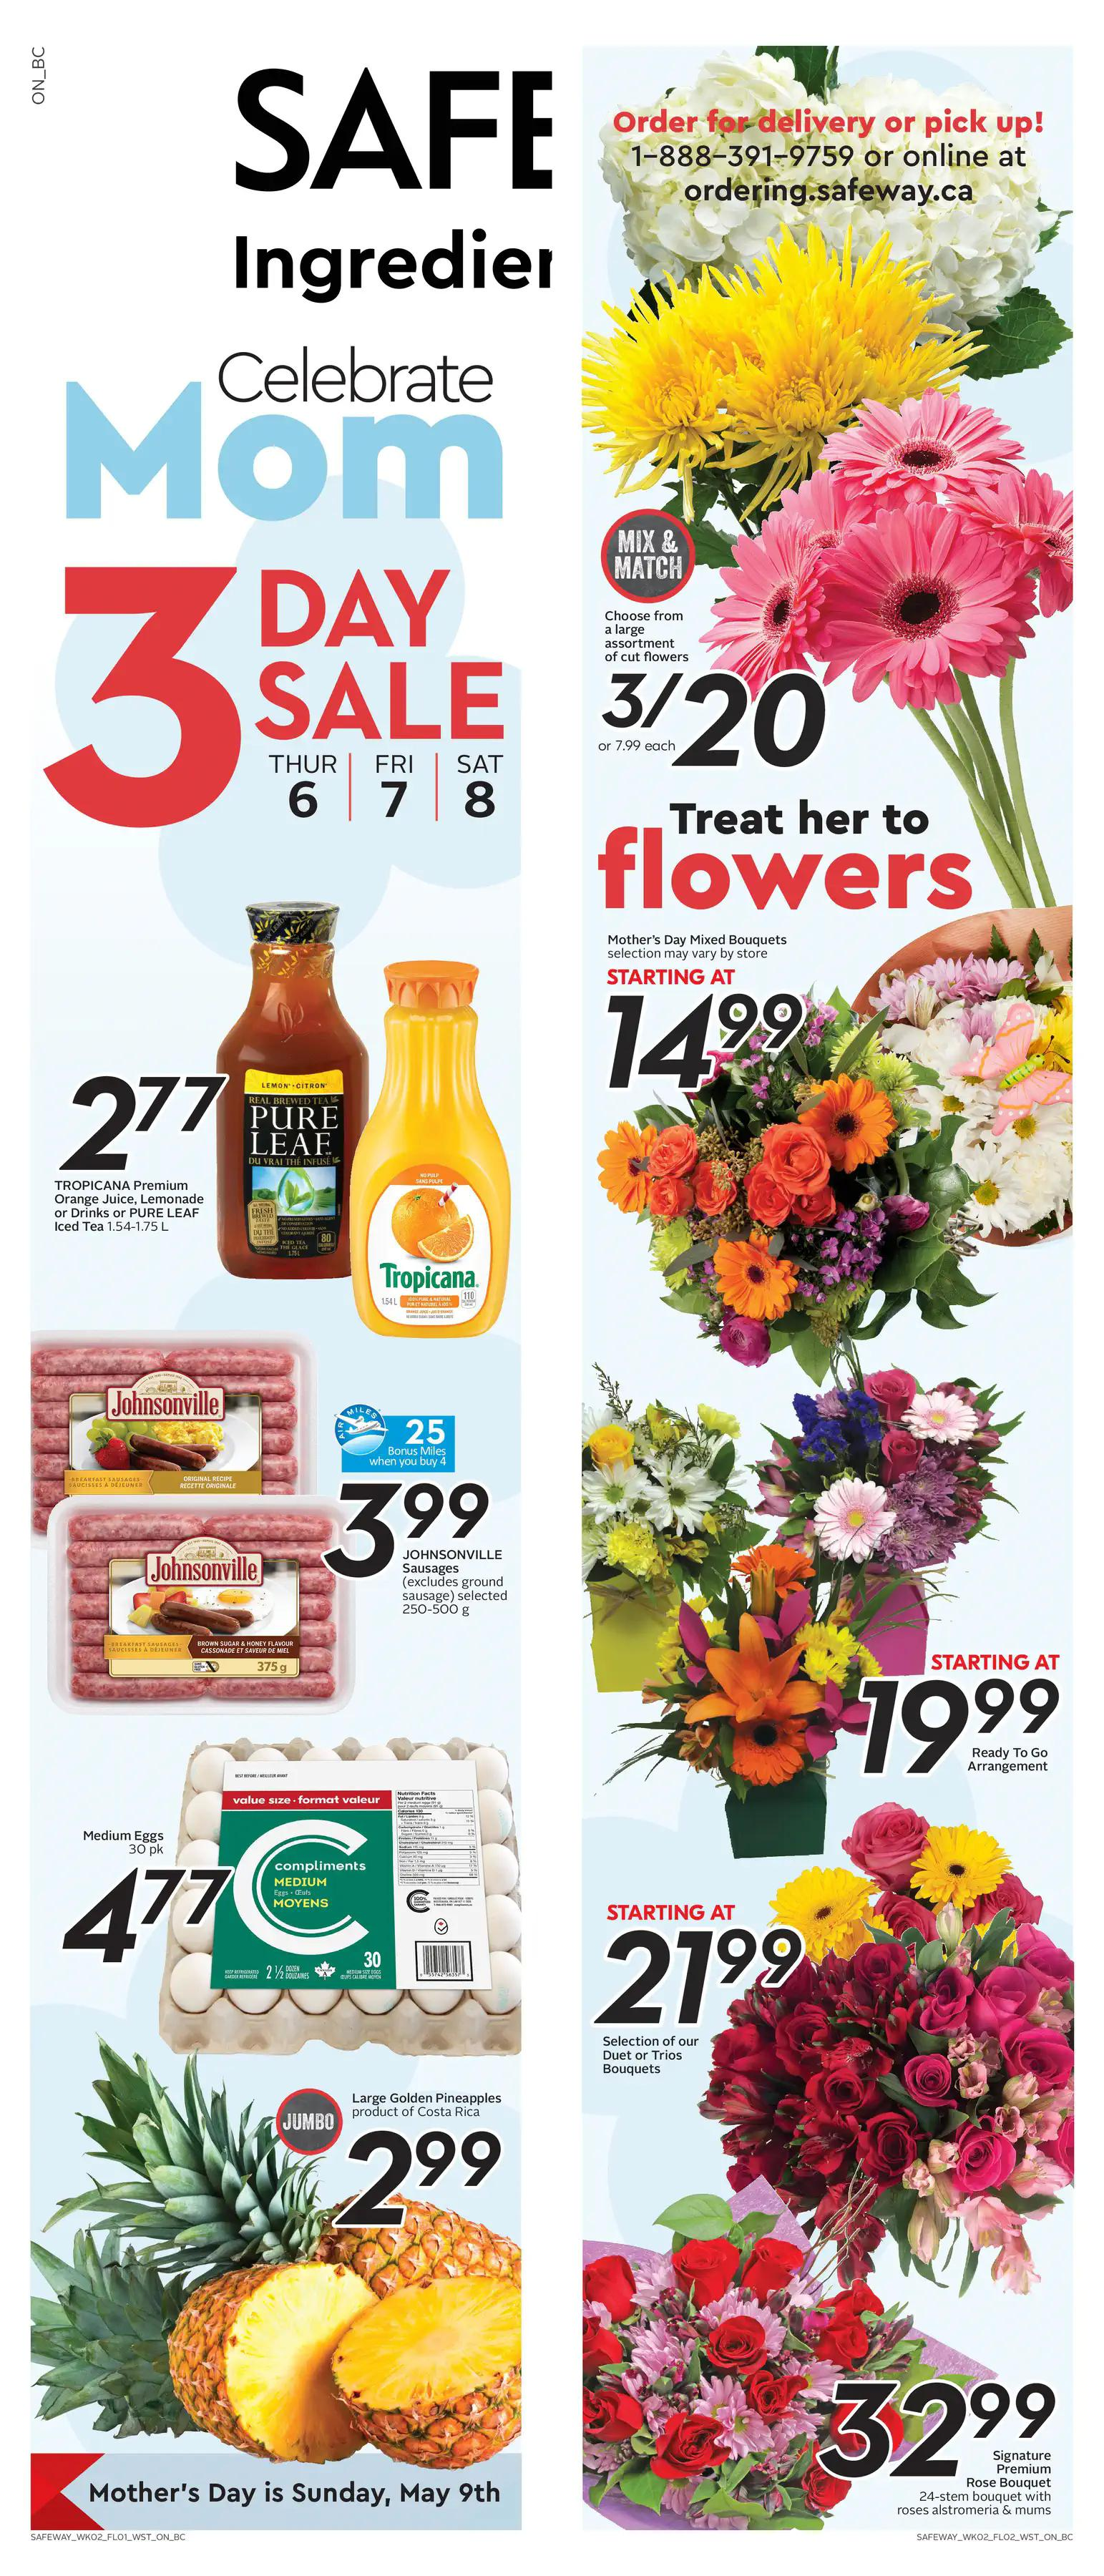 Safeway - Weekly Flyer Specials - Page 1